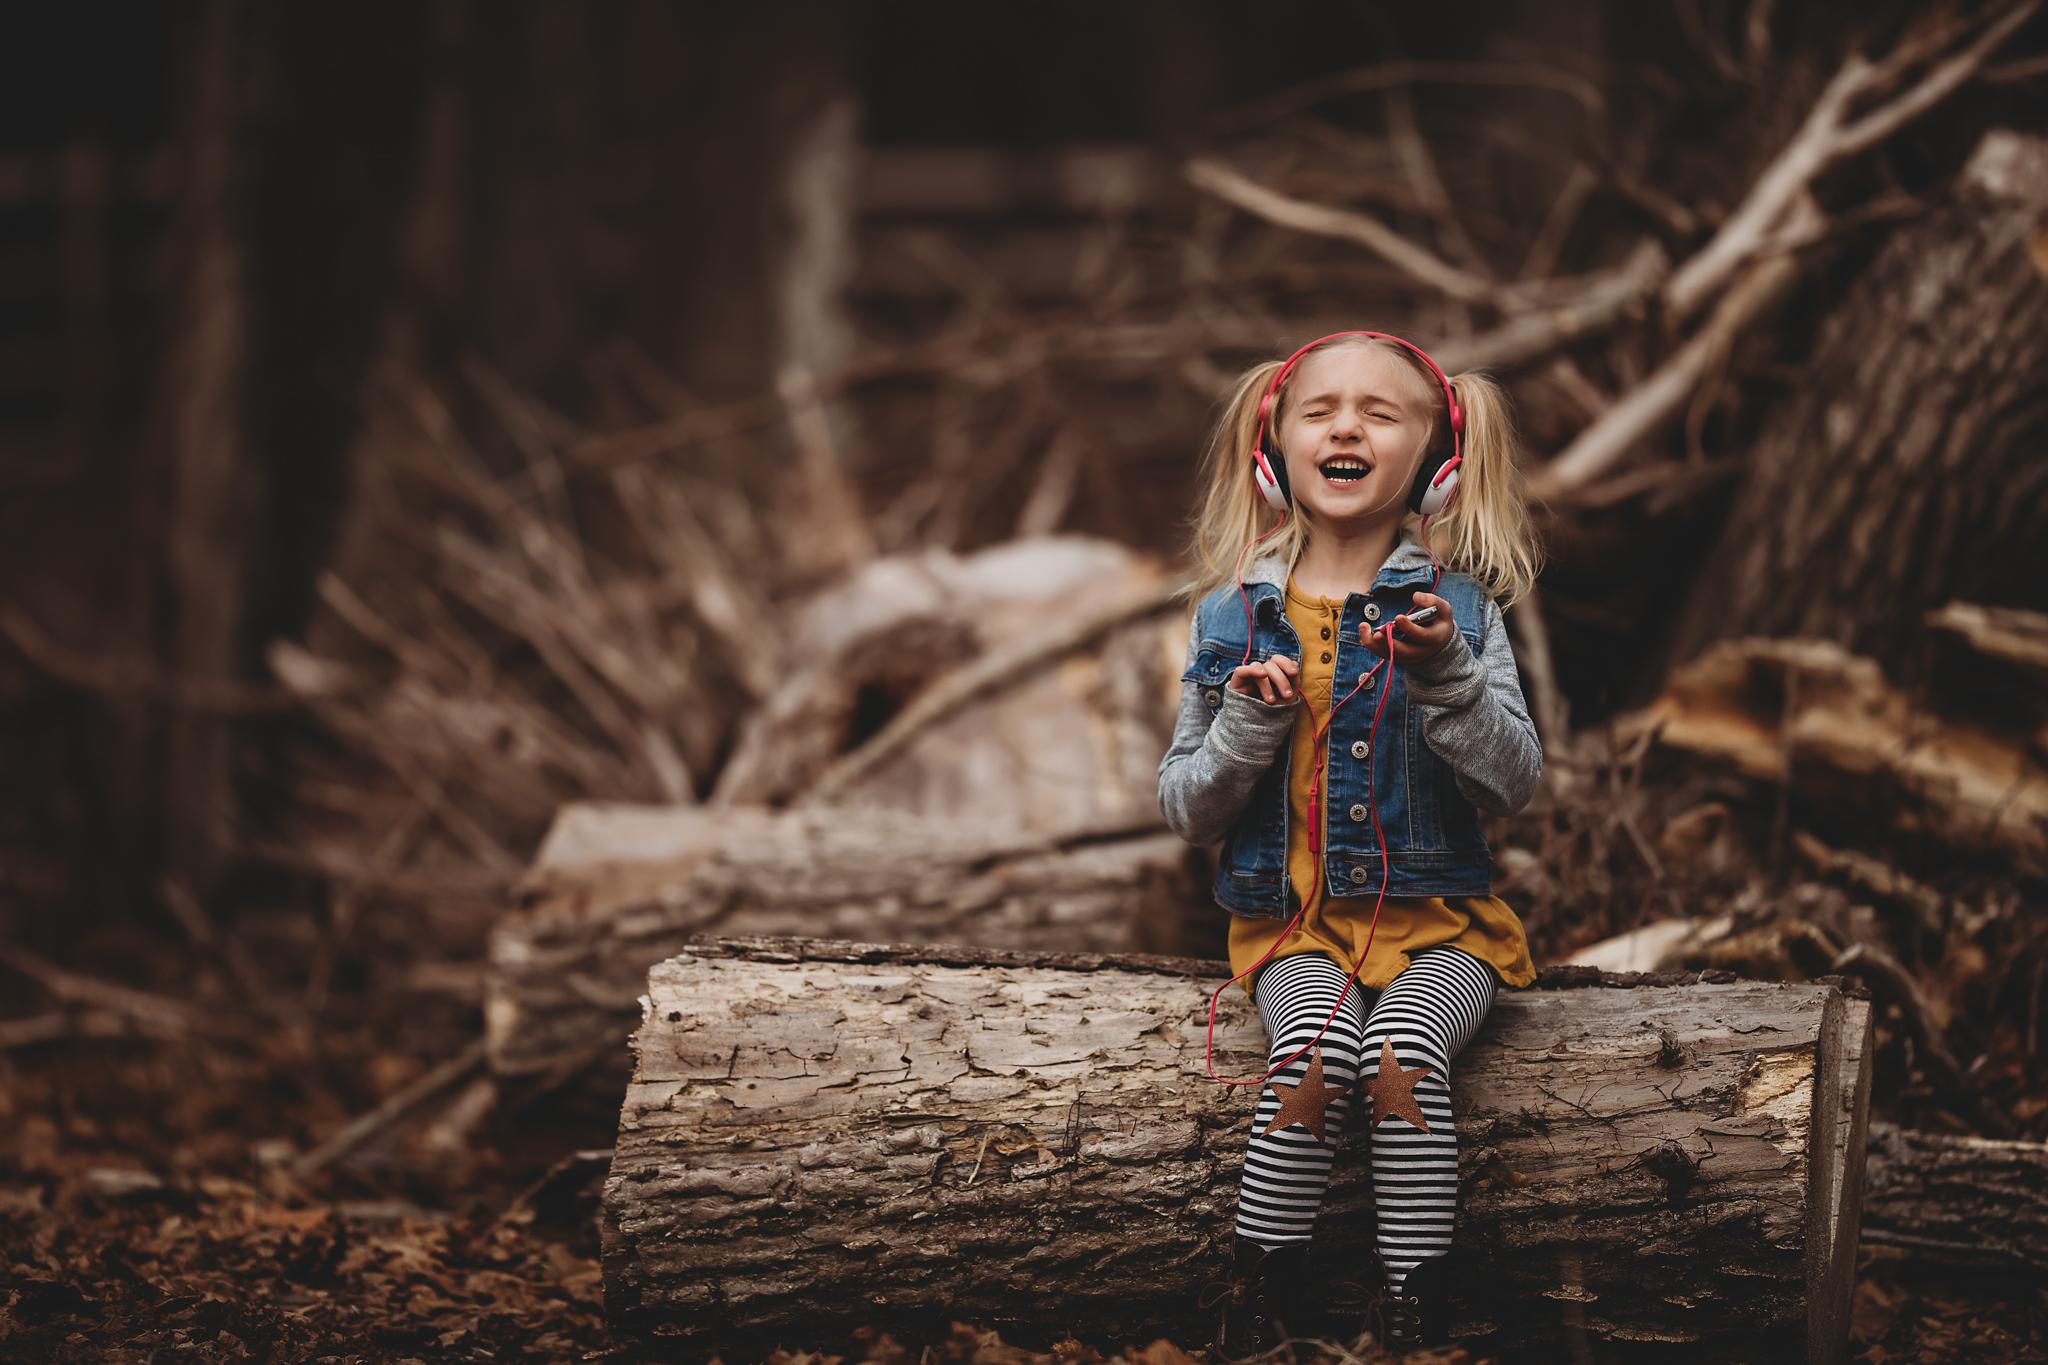 Long-island-photographer-hello-olivia-photography-children-kids-photos-new-york-lifestyle-portraits-suffolk-County-LI-45.jpg